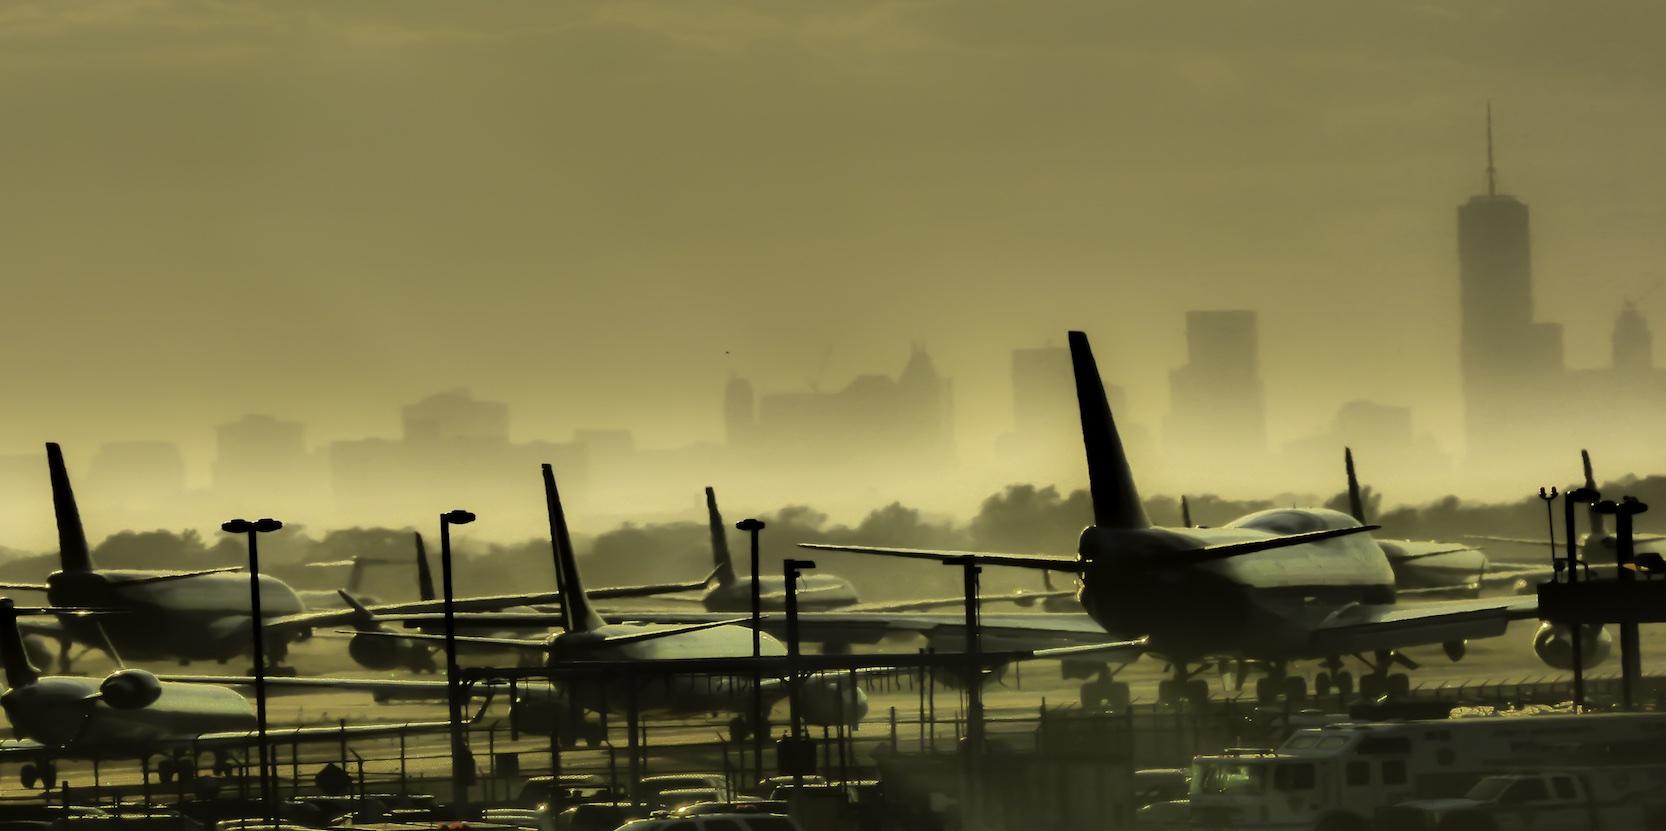 New York Kennedy Airport